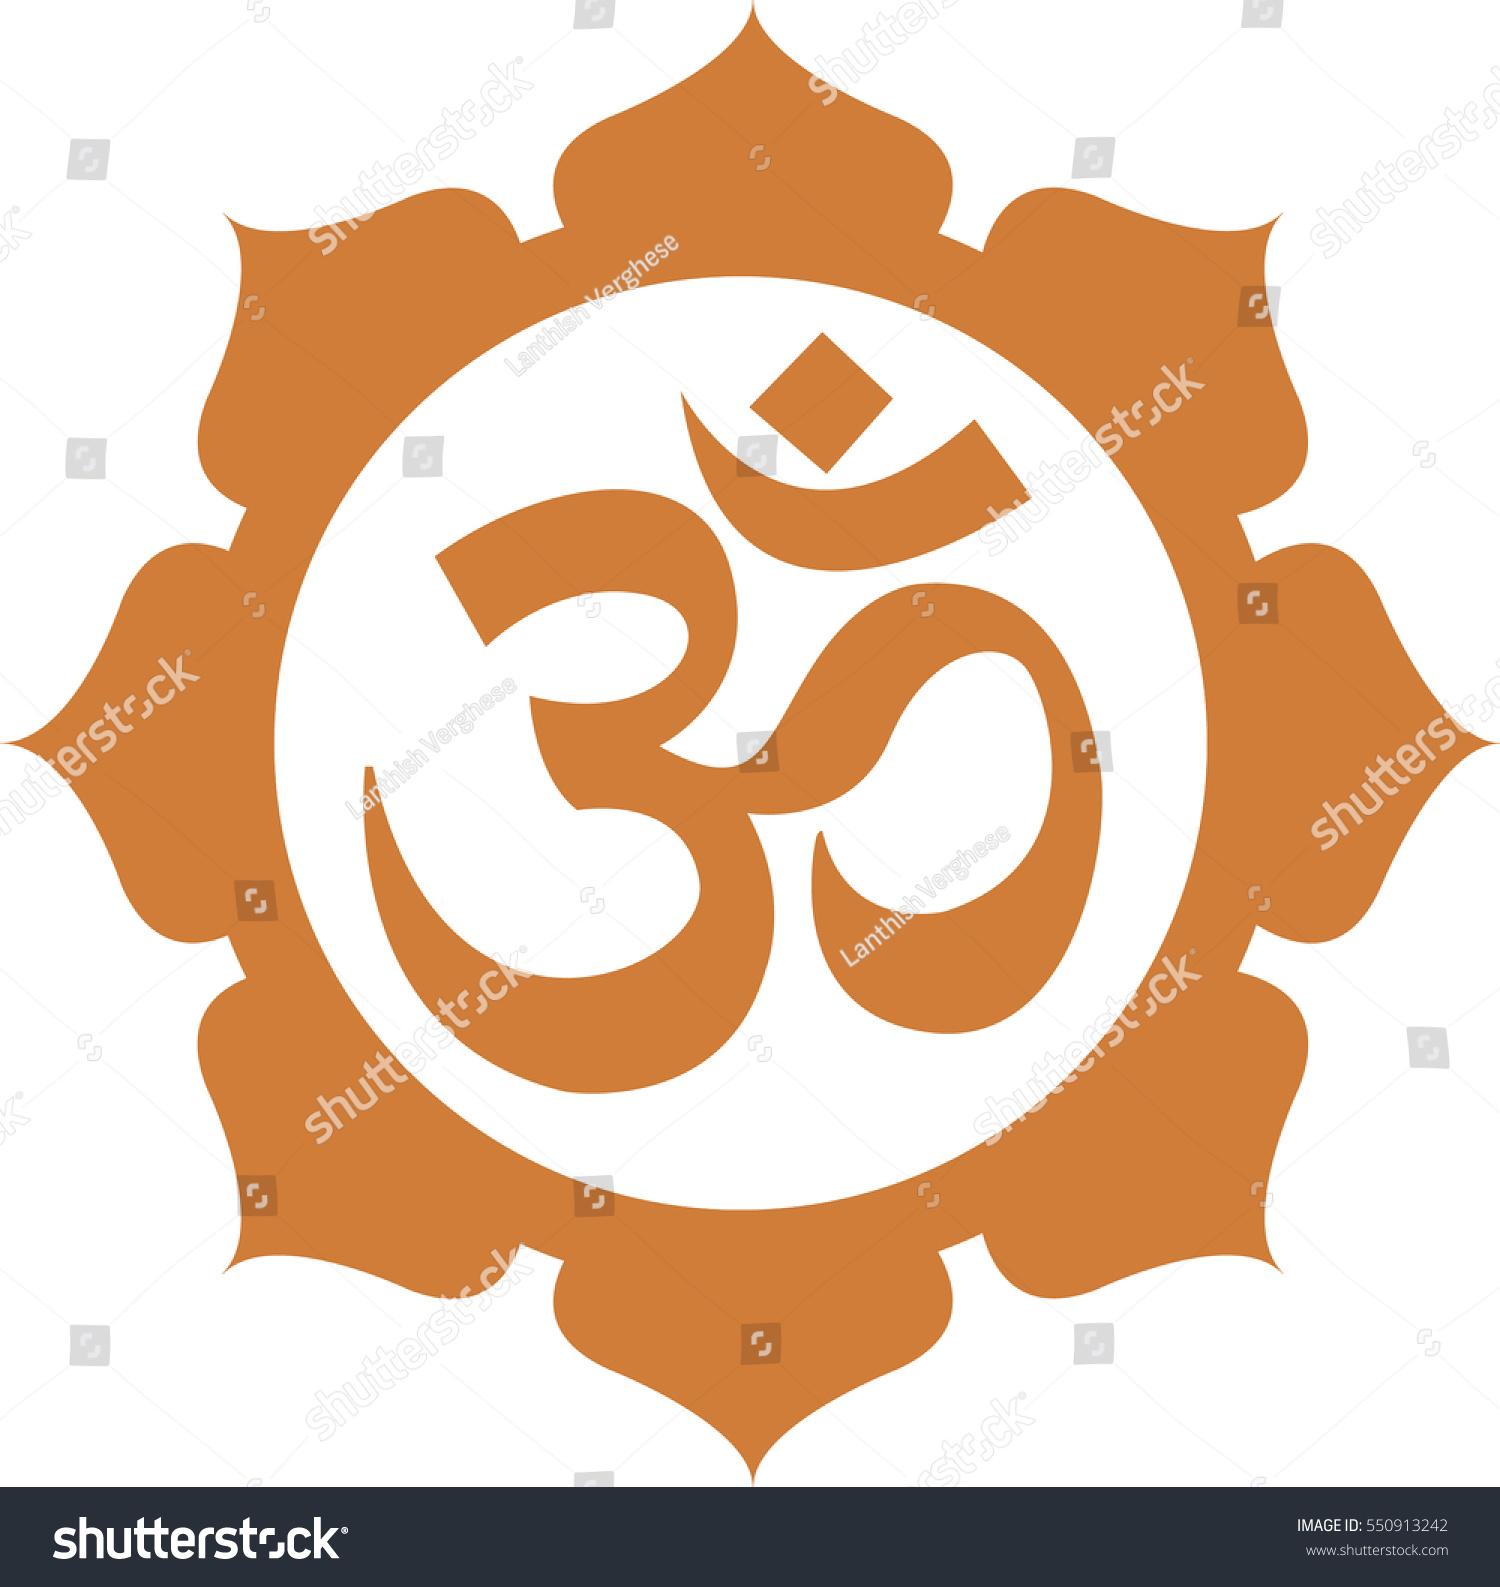 Hindu religious symbol om stock vector 550913242 shutterstock hindu religious symbol om biocorpaavc